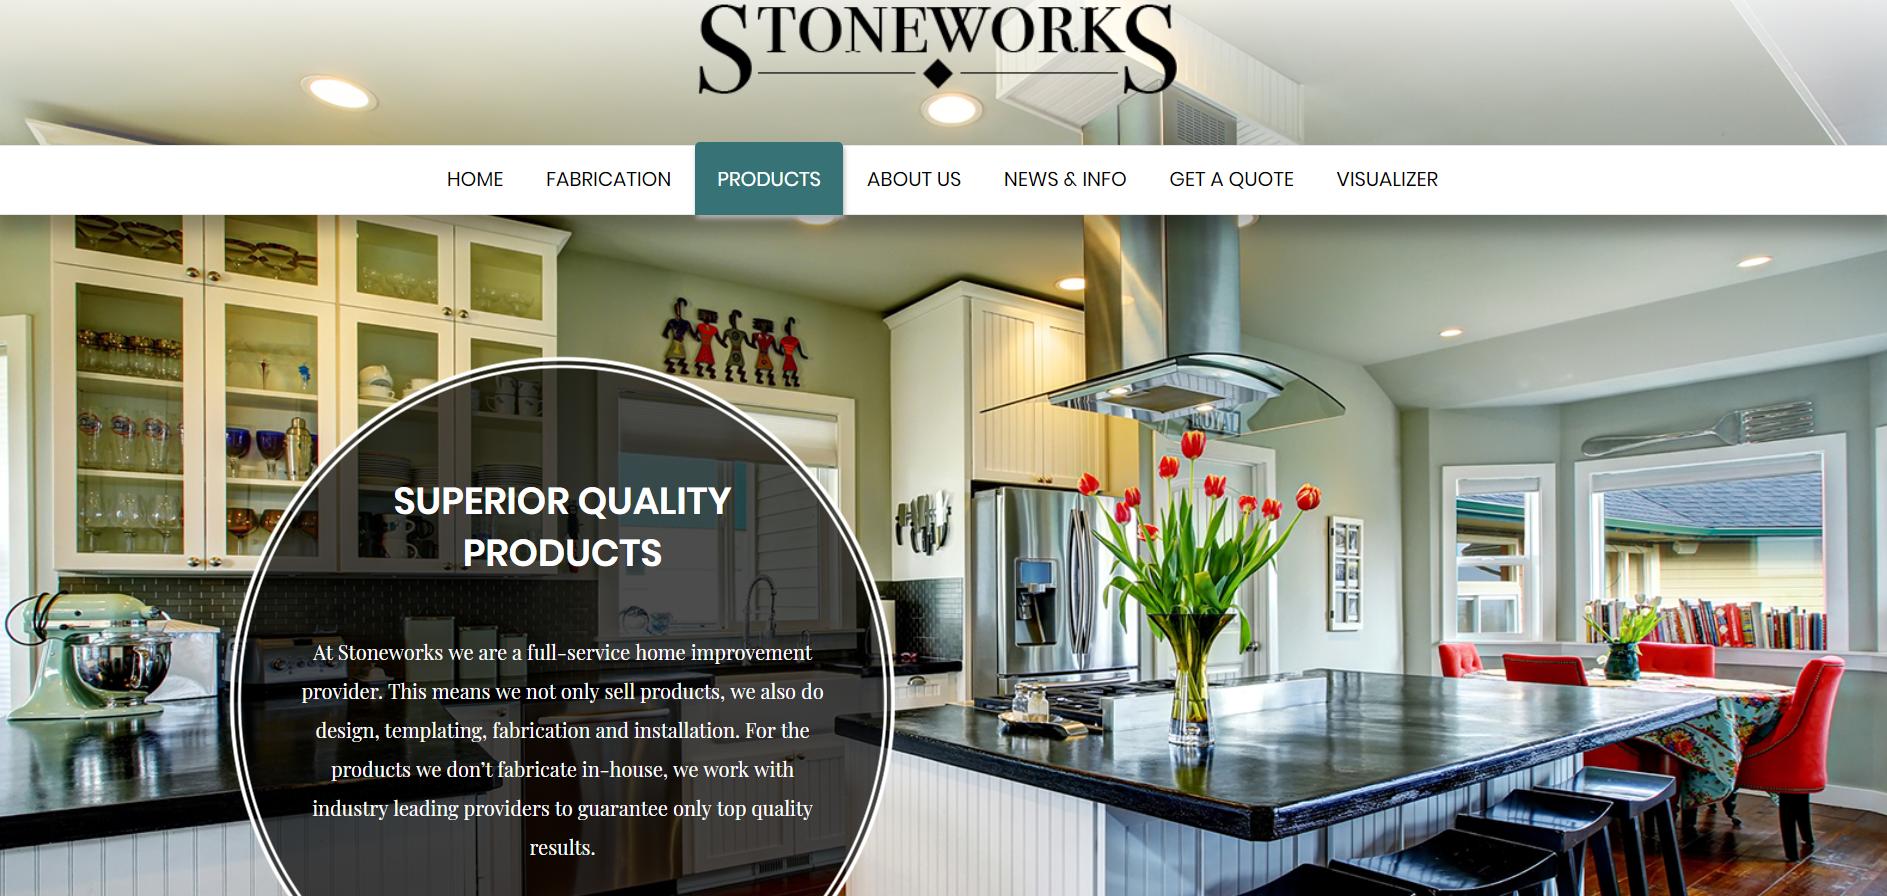 Stoneworks-site-image